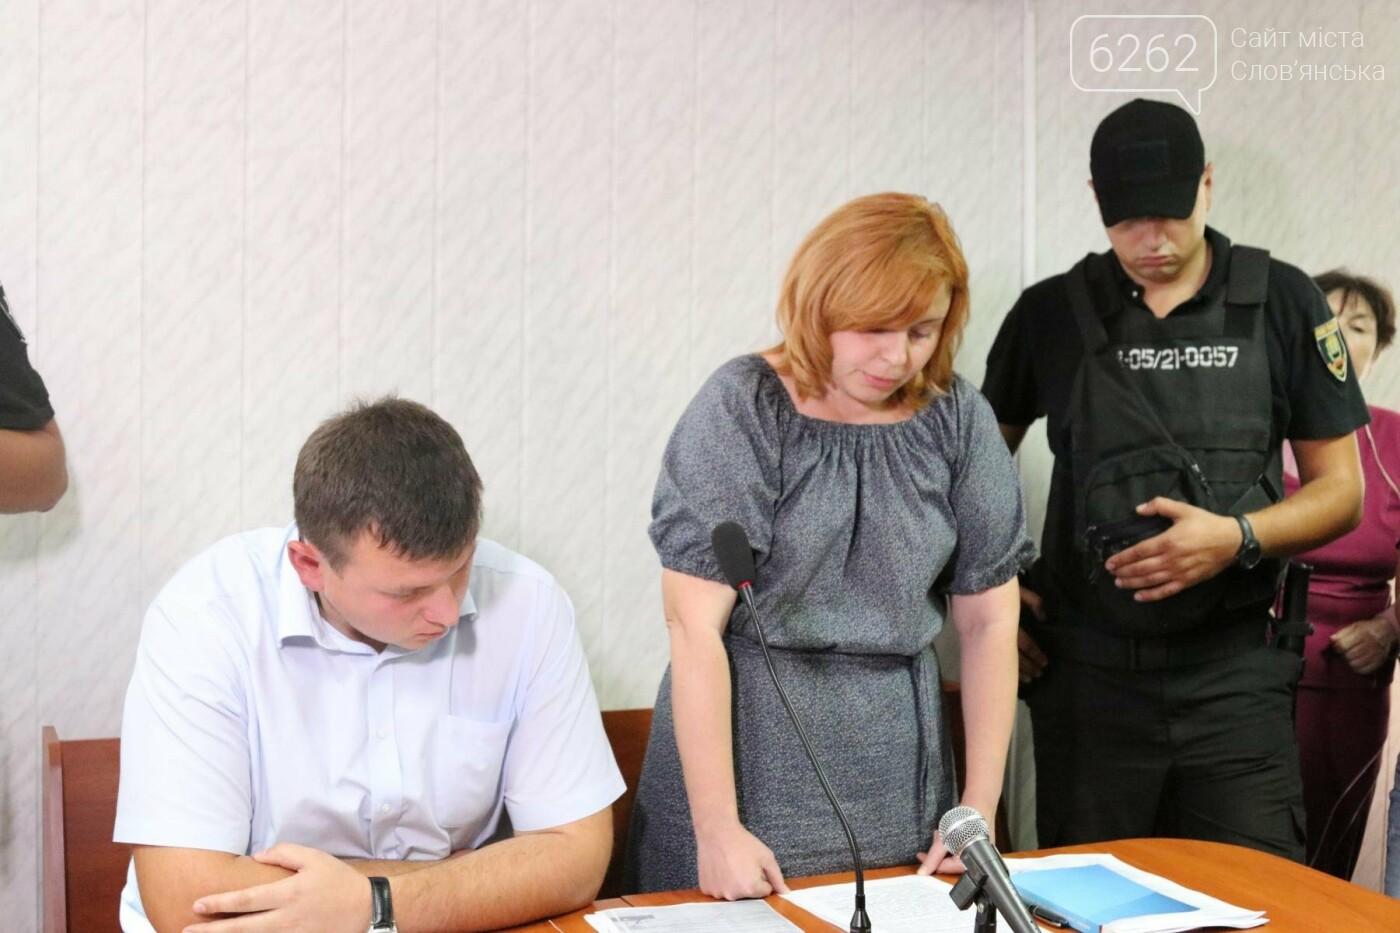 Суд над активистом Василием Хоменко. Подробности (ВИДЕО), фото-1